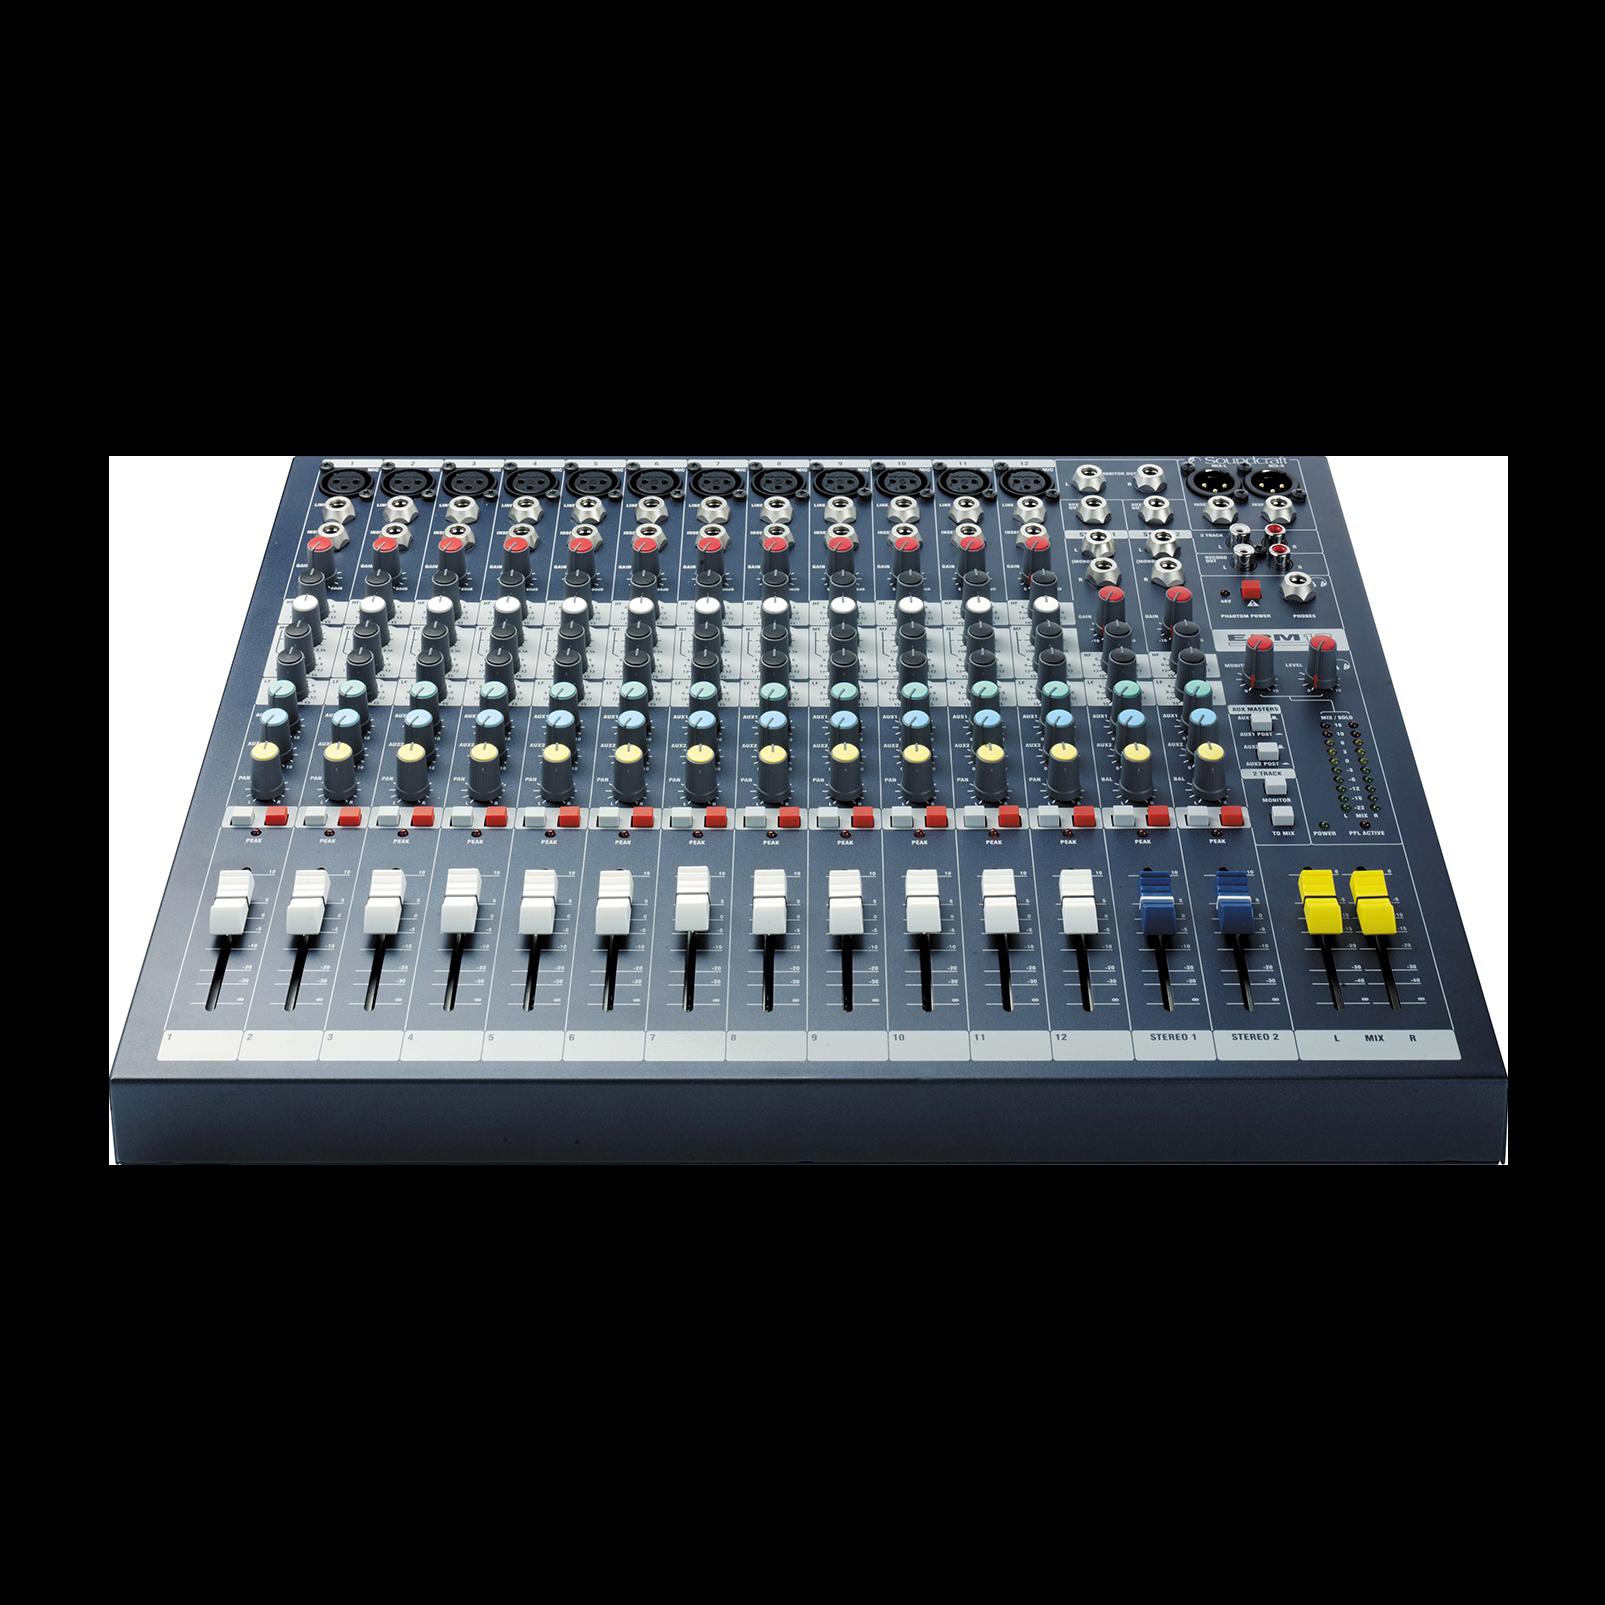 EPM12 - Dark Blue - A multipurpose mixer that carries the hallmarks of Soundcraft's professional heritage. - Detailshot 1